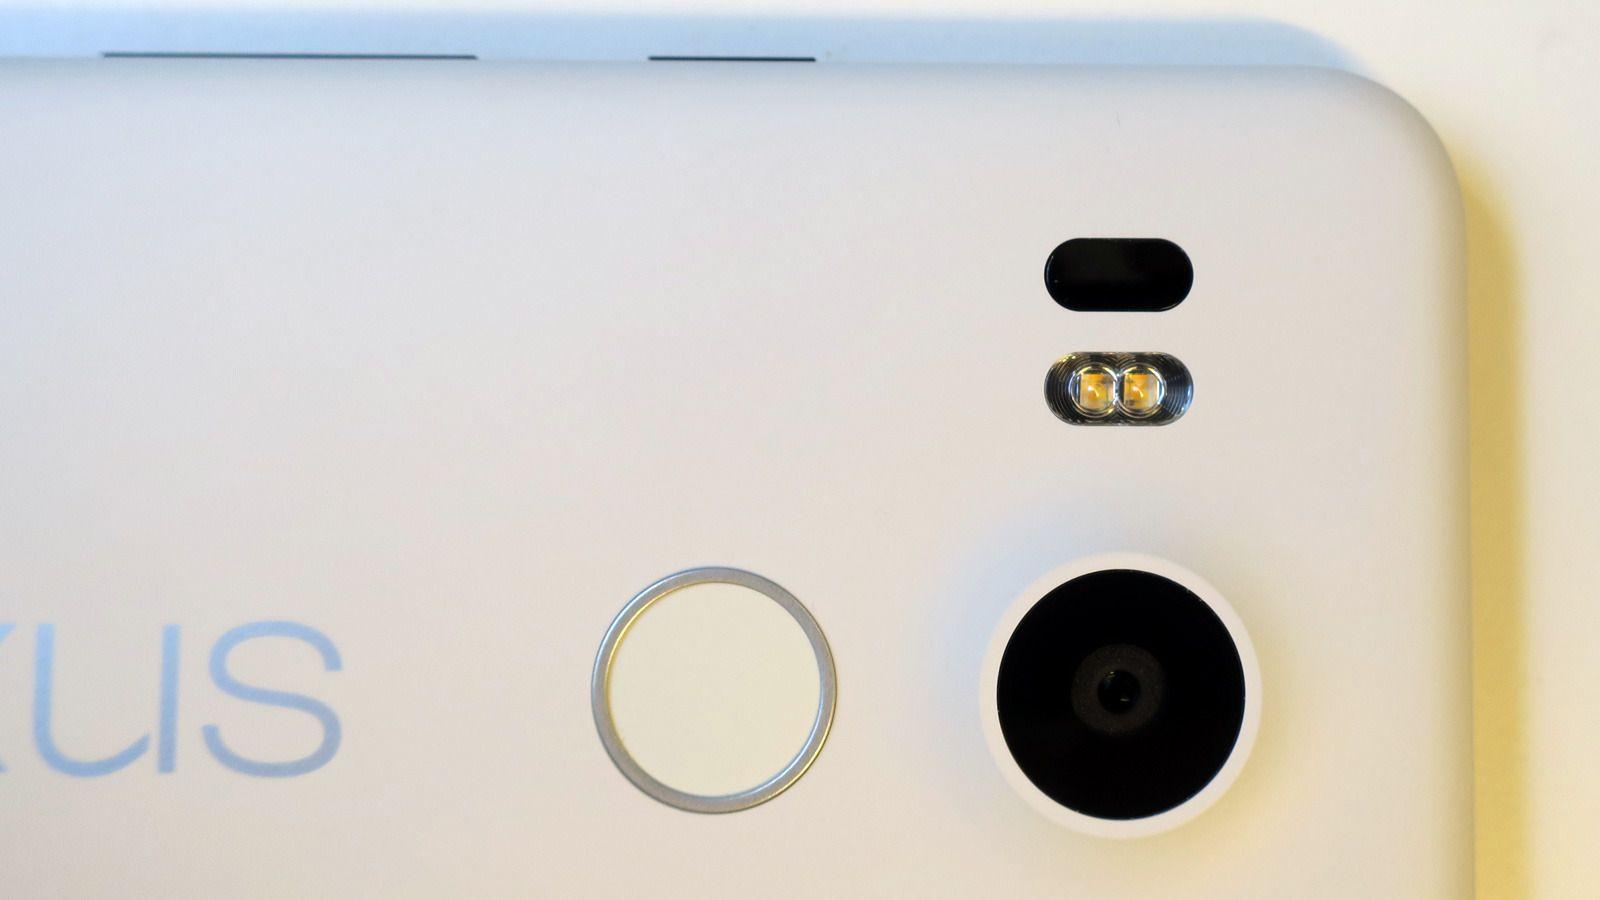 Nexus 5X har en fotolampe med to lysdioder. Foto: Espen Irwing Swang, Tek.no